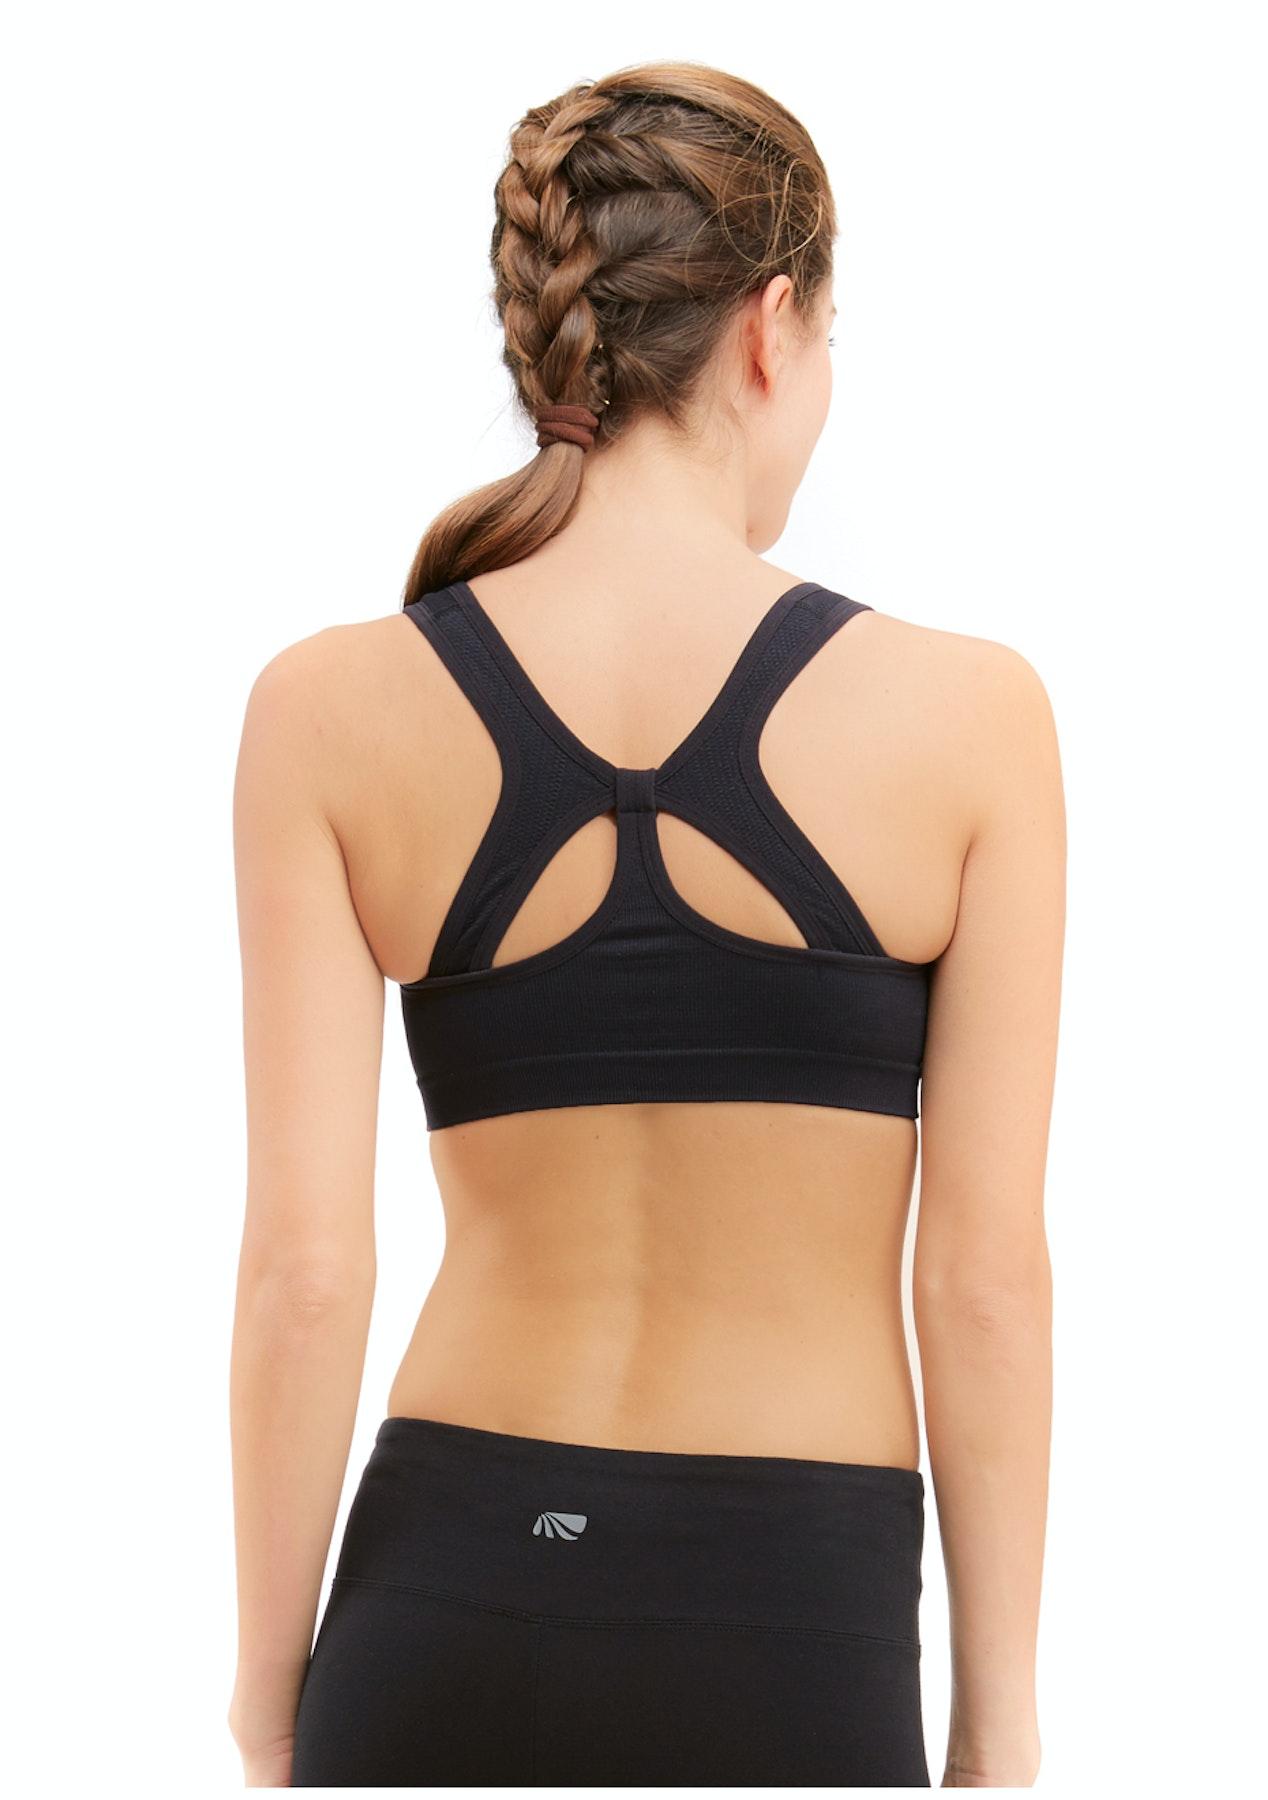 de308e0f37f5f Marika Tek - Sport Bra - Black - Marika Activewear Up To 63% Off - Onceit